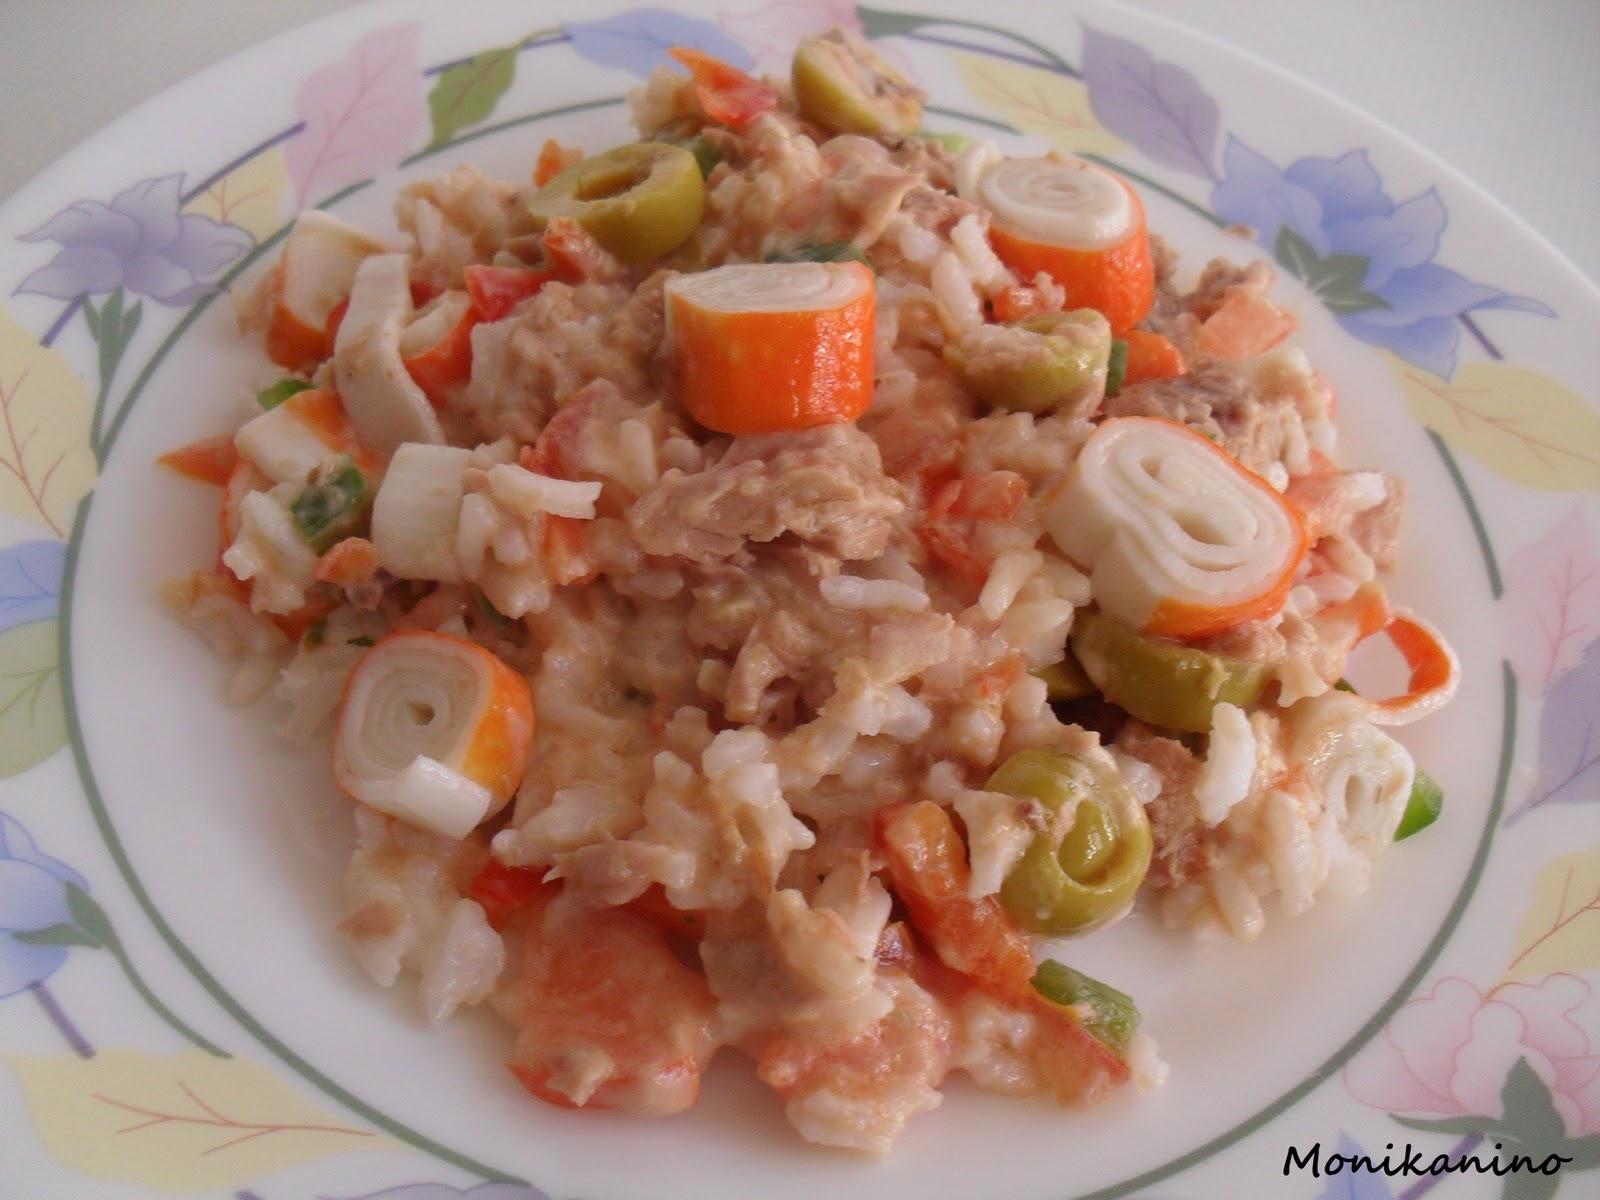 Monikaninococimo ensalada de arroz - Ensalada de arroz y atun ...